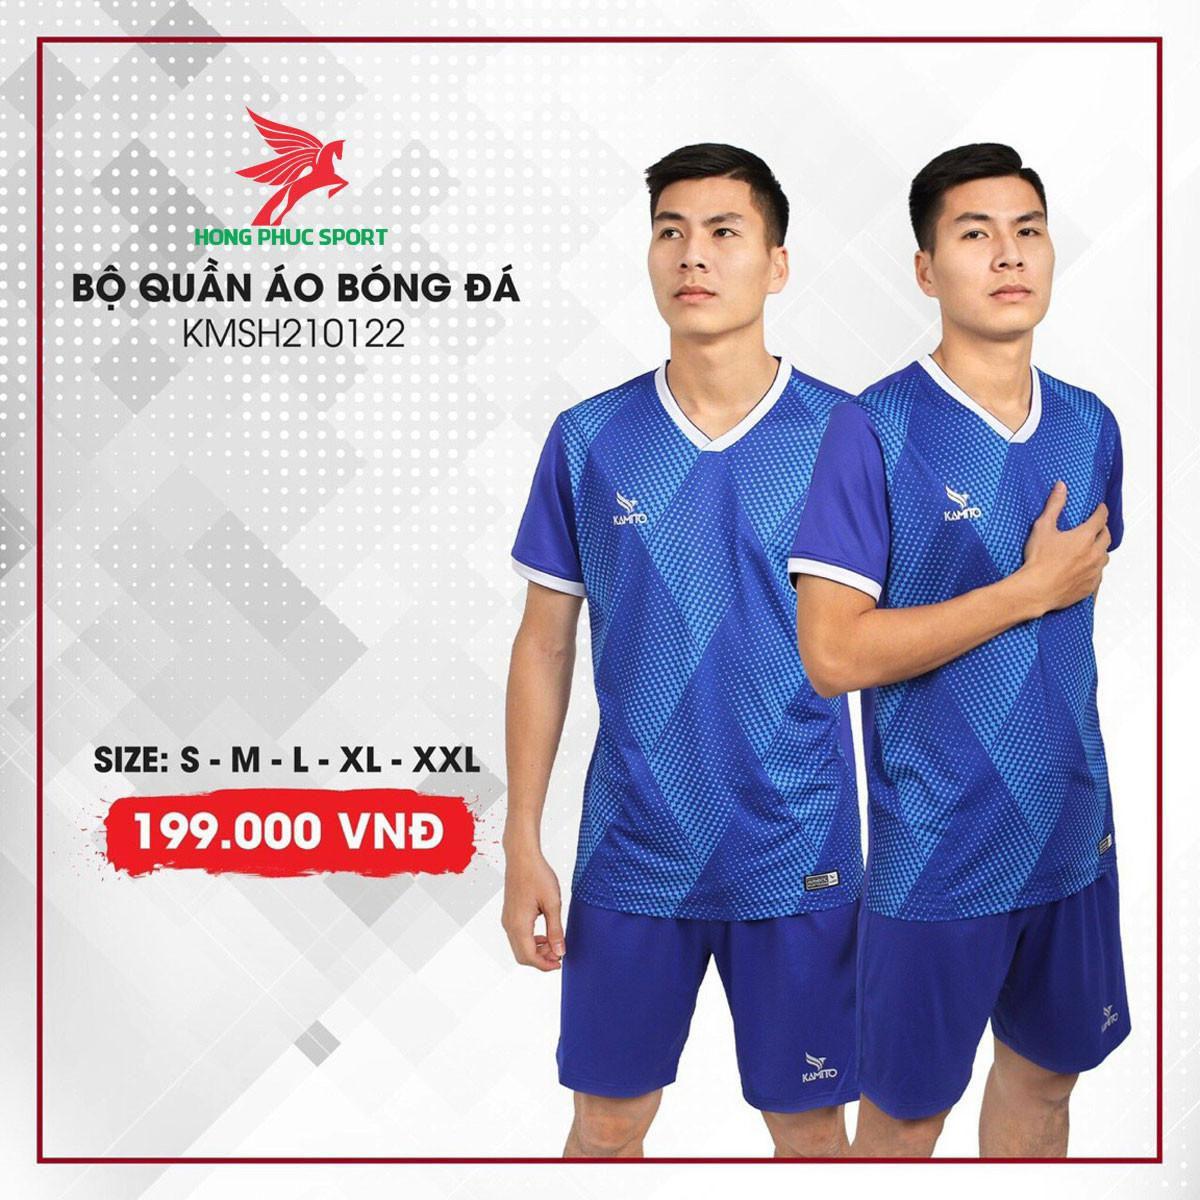 https://cdn.hongphucsport.com/unsafe/s4.shopbay.vn/files/285/ao-khong-logo-kamito-msh2101-mau-xanh-duong-6052db20ea913.jpg